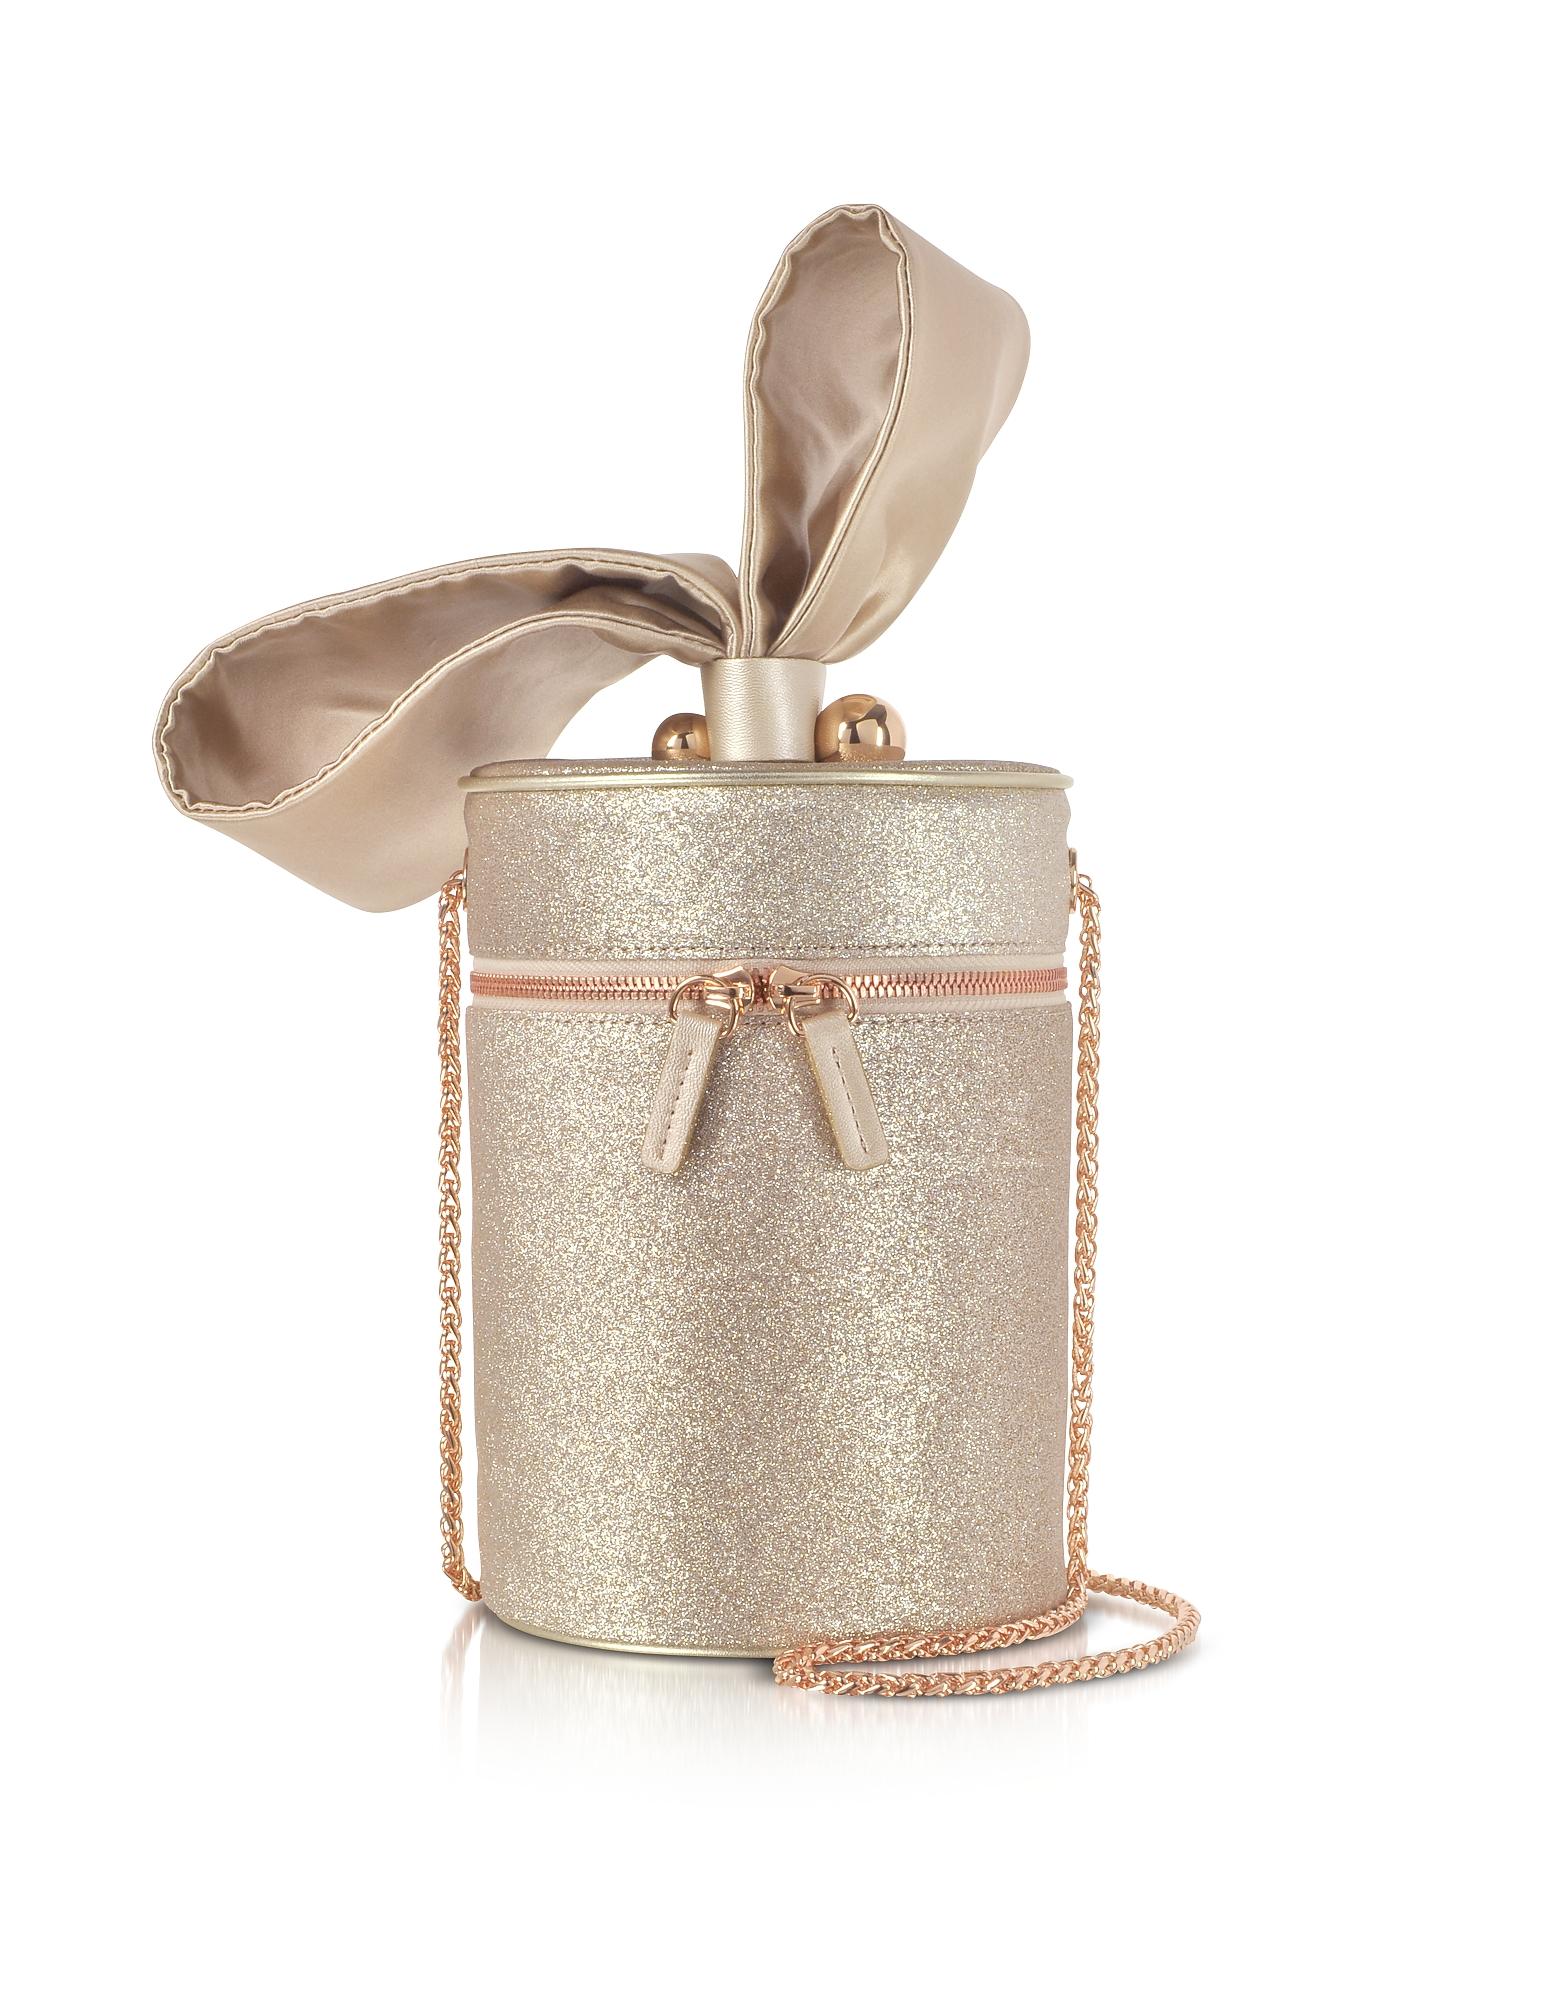 Sophia Webster Handbags, Champagne Bonnie Glitter Cross Body Bag